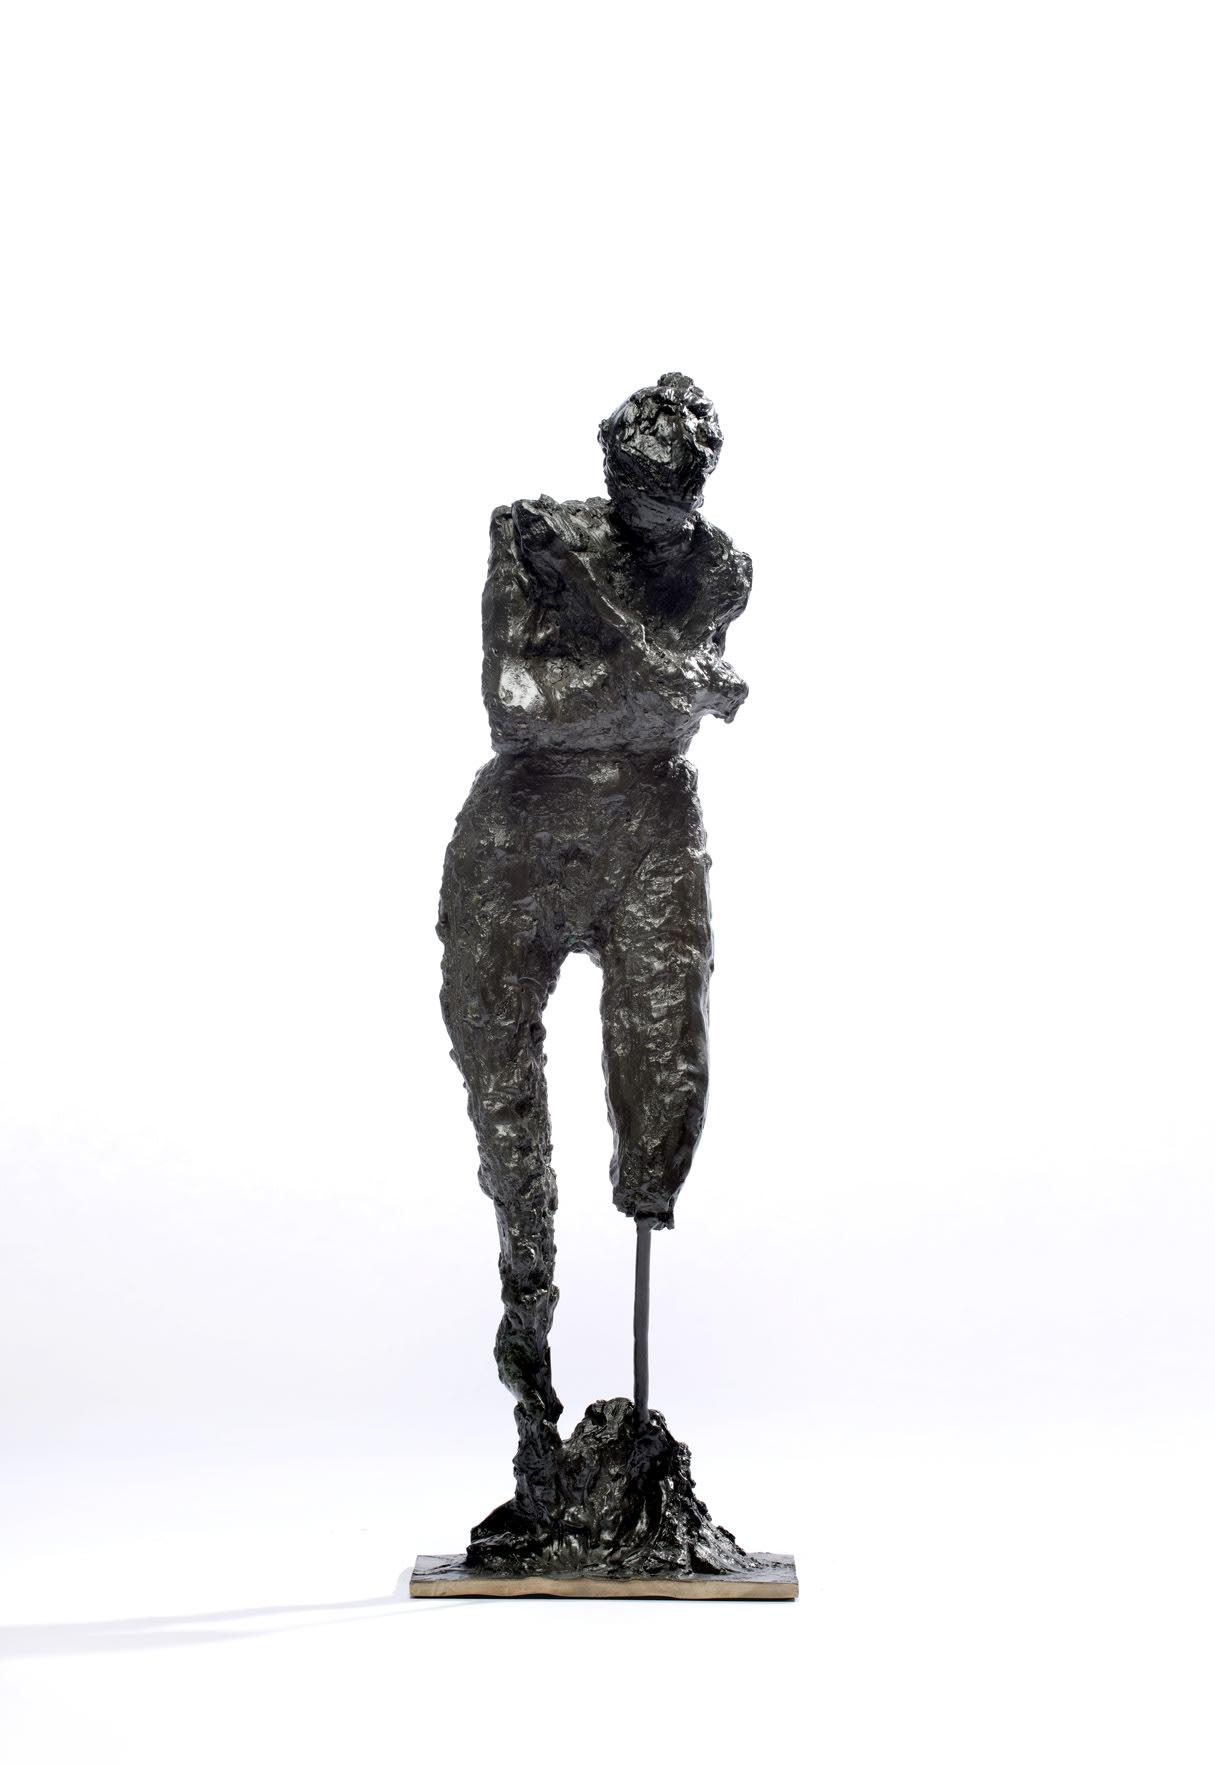 "<span class=""link fancybox-details-link""><a href=""/artworks/1685-emilio-diiorio-courage-2014/"">View Detail Page</a></span><div class=""artist""><strong>Emilio DiIorio</strong></div> <div class=""title""><em>Courage</em>, 2014</div> <div class=""medium"">bronze</div> <div class=""dimensions"">27"" x 6 1/2"" x 6""</div><div class=""copyright_line"">Copyright The Artist</div>"